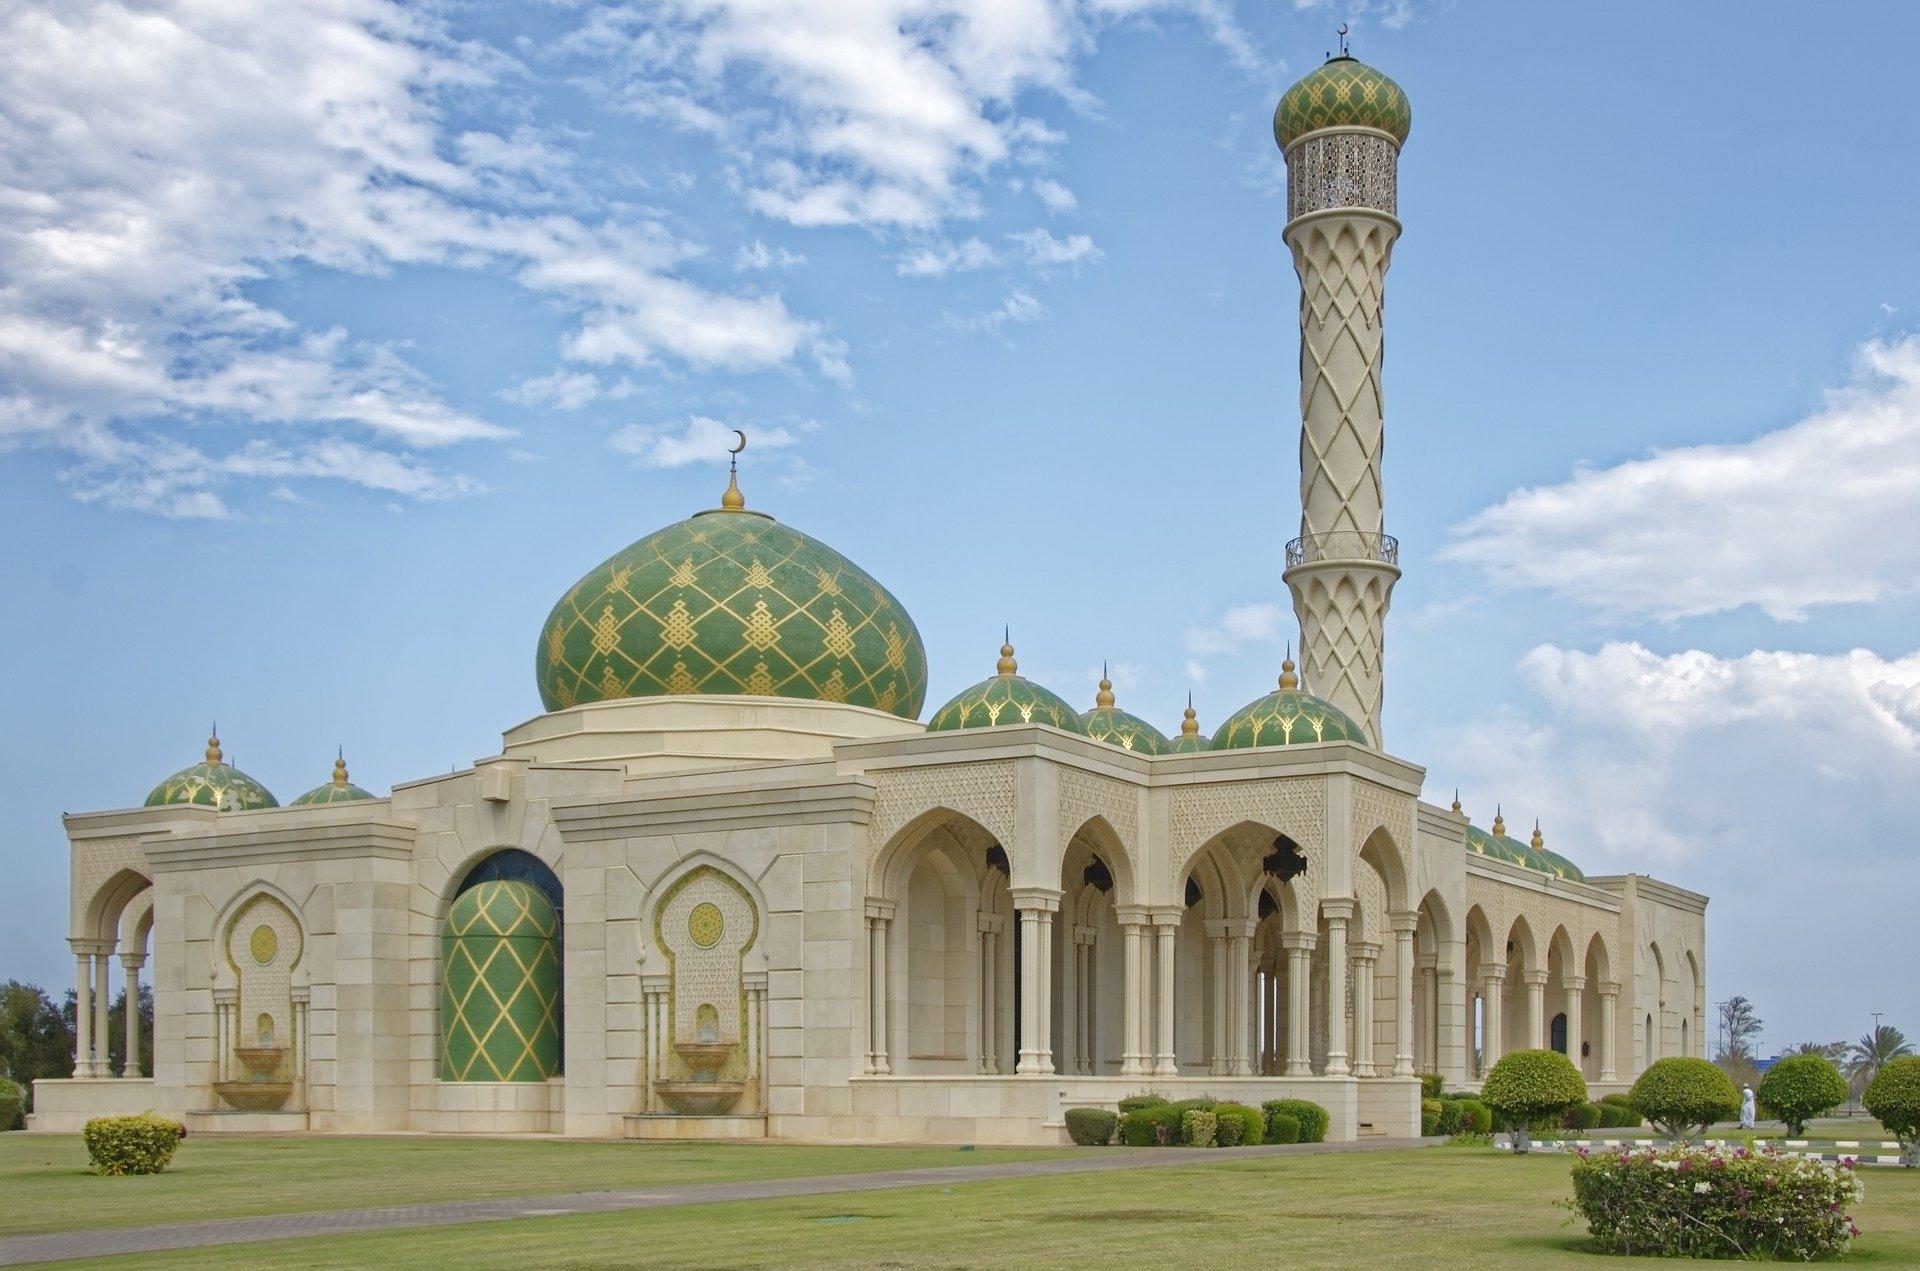 Grande Mosquée, joyaux de Mascate